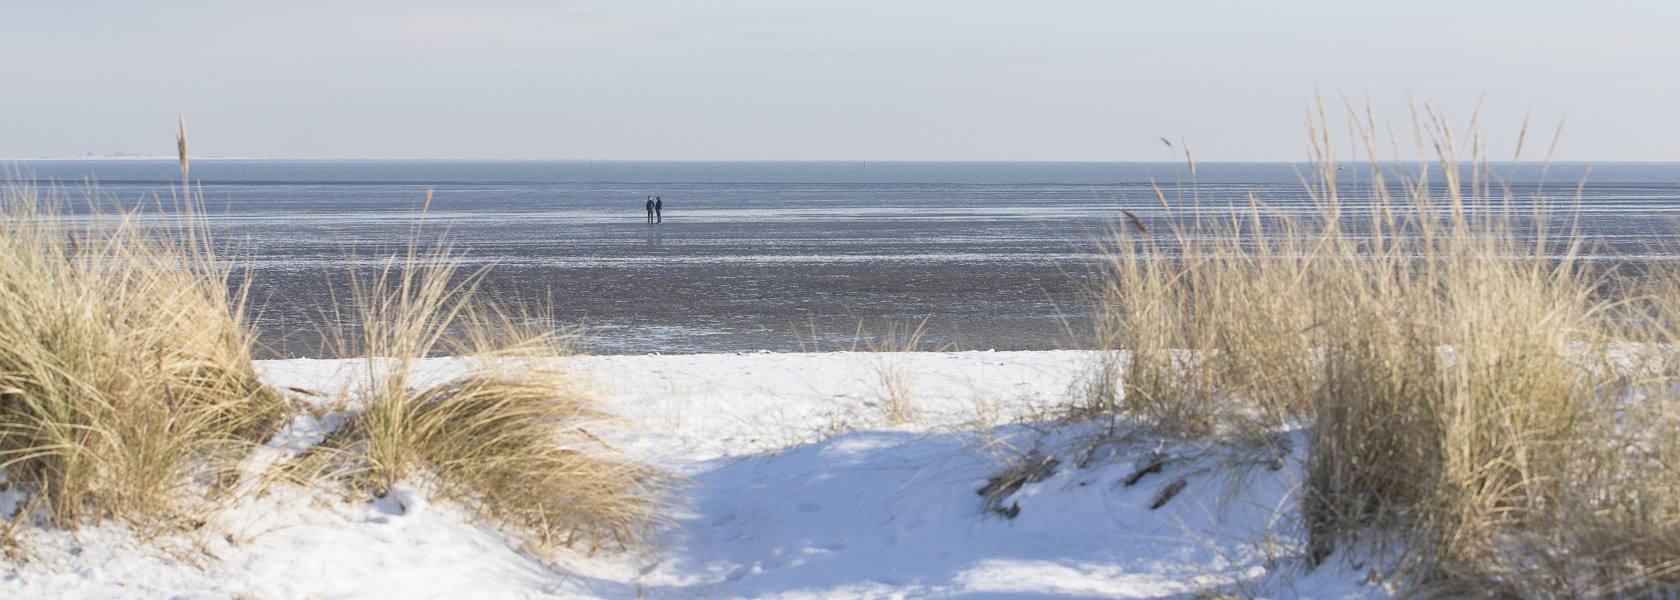 Winterwatt in Schillg, © Wangerland Touristik GmbH